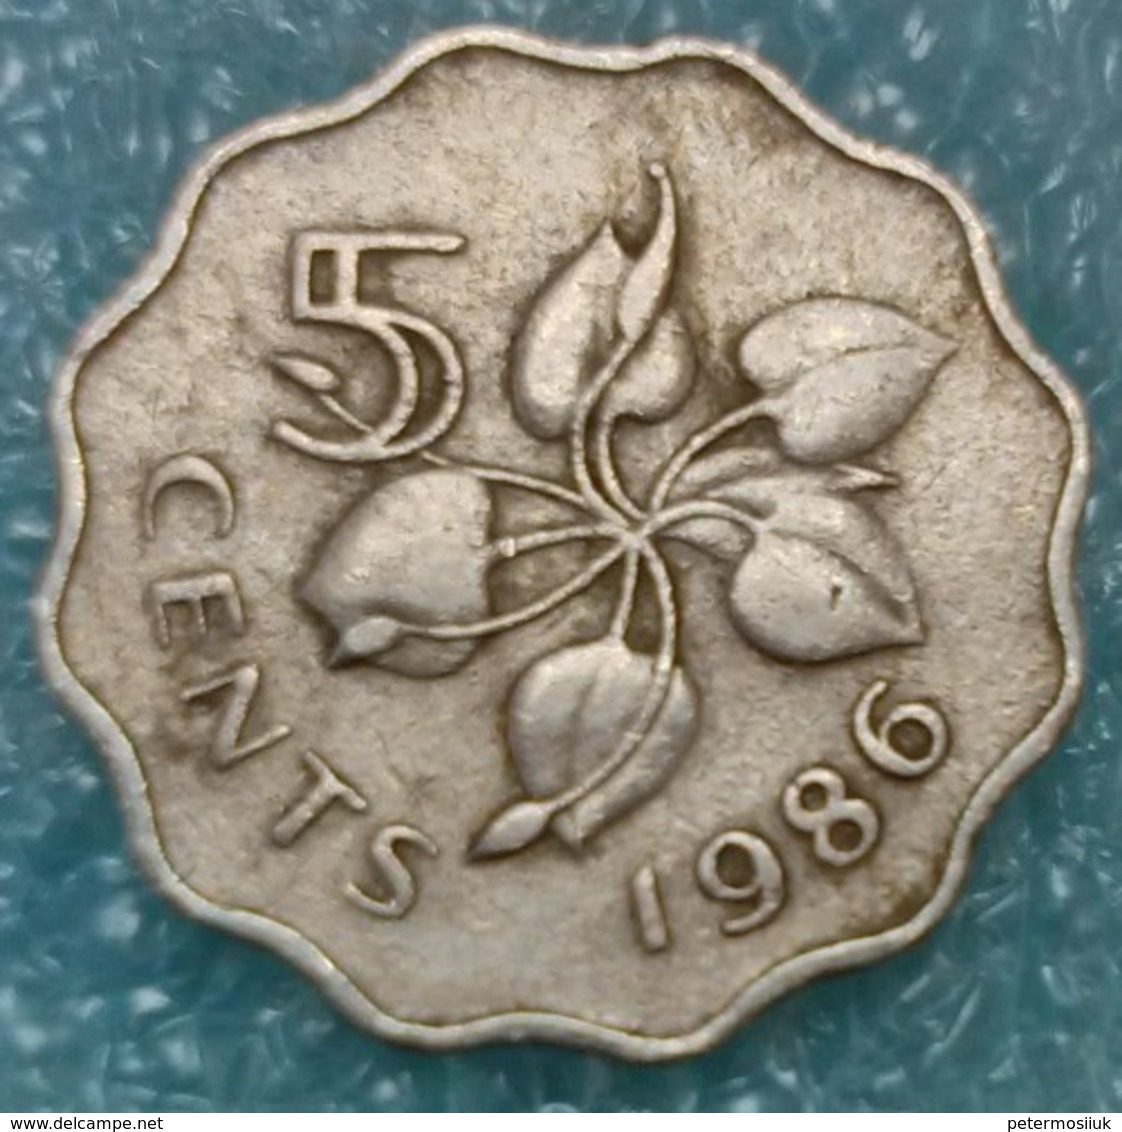 Swaziland 5 Cents, 1986 -0779 - Swaziland